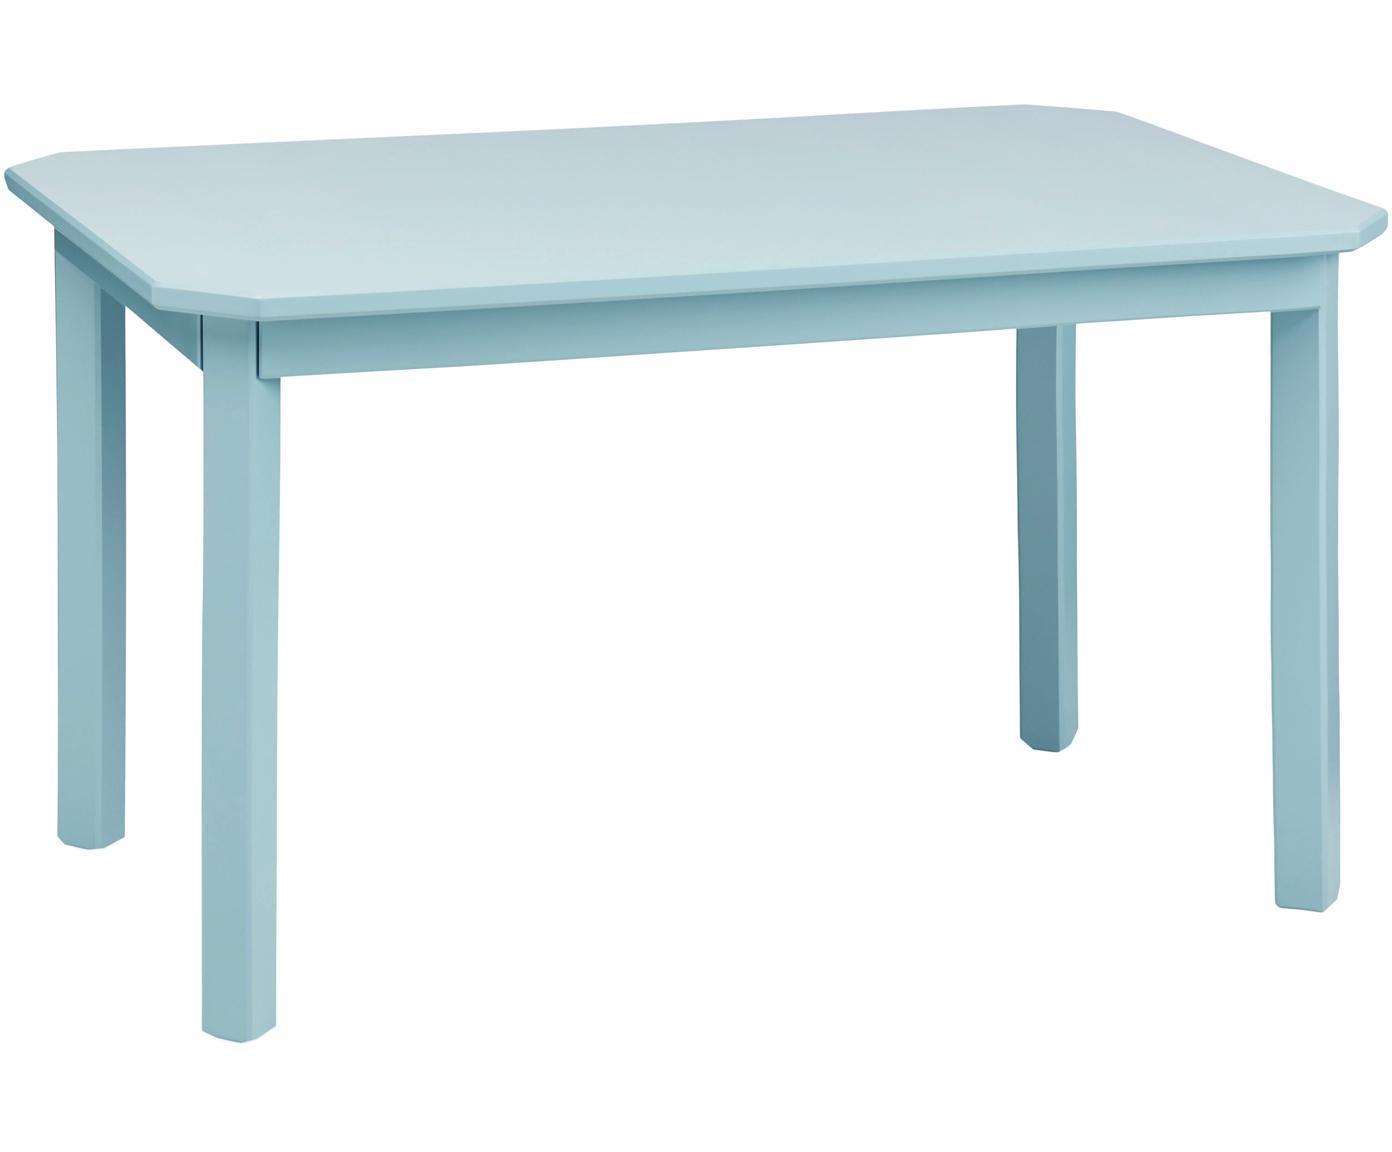 Kindertafel Harlequin, Berkenhout, gelakt MDF, Blauw, 79 x 47 cm